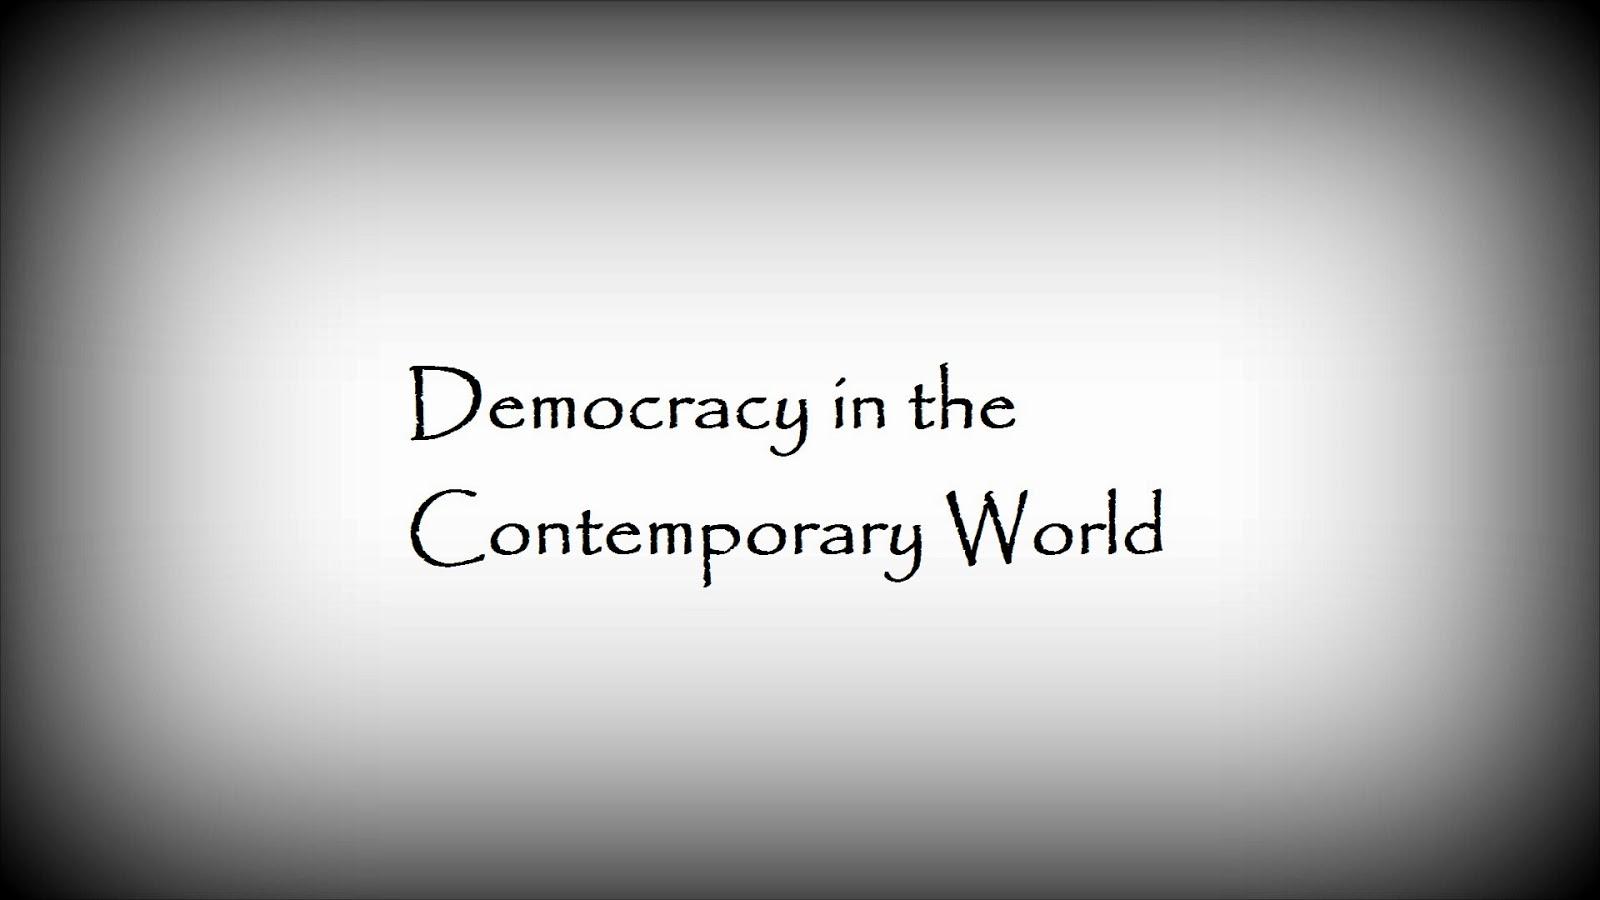 Democracy in the contemplary world